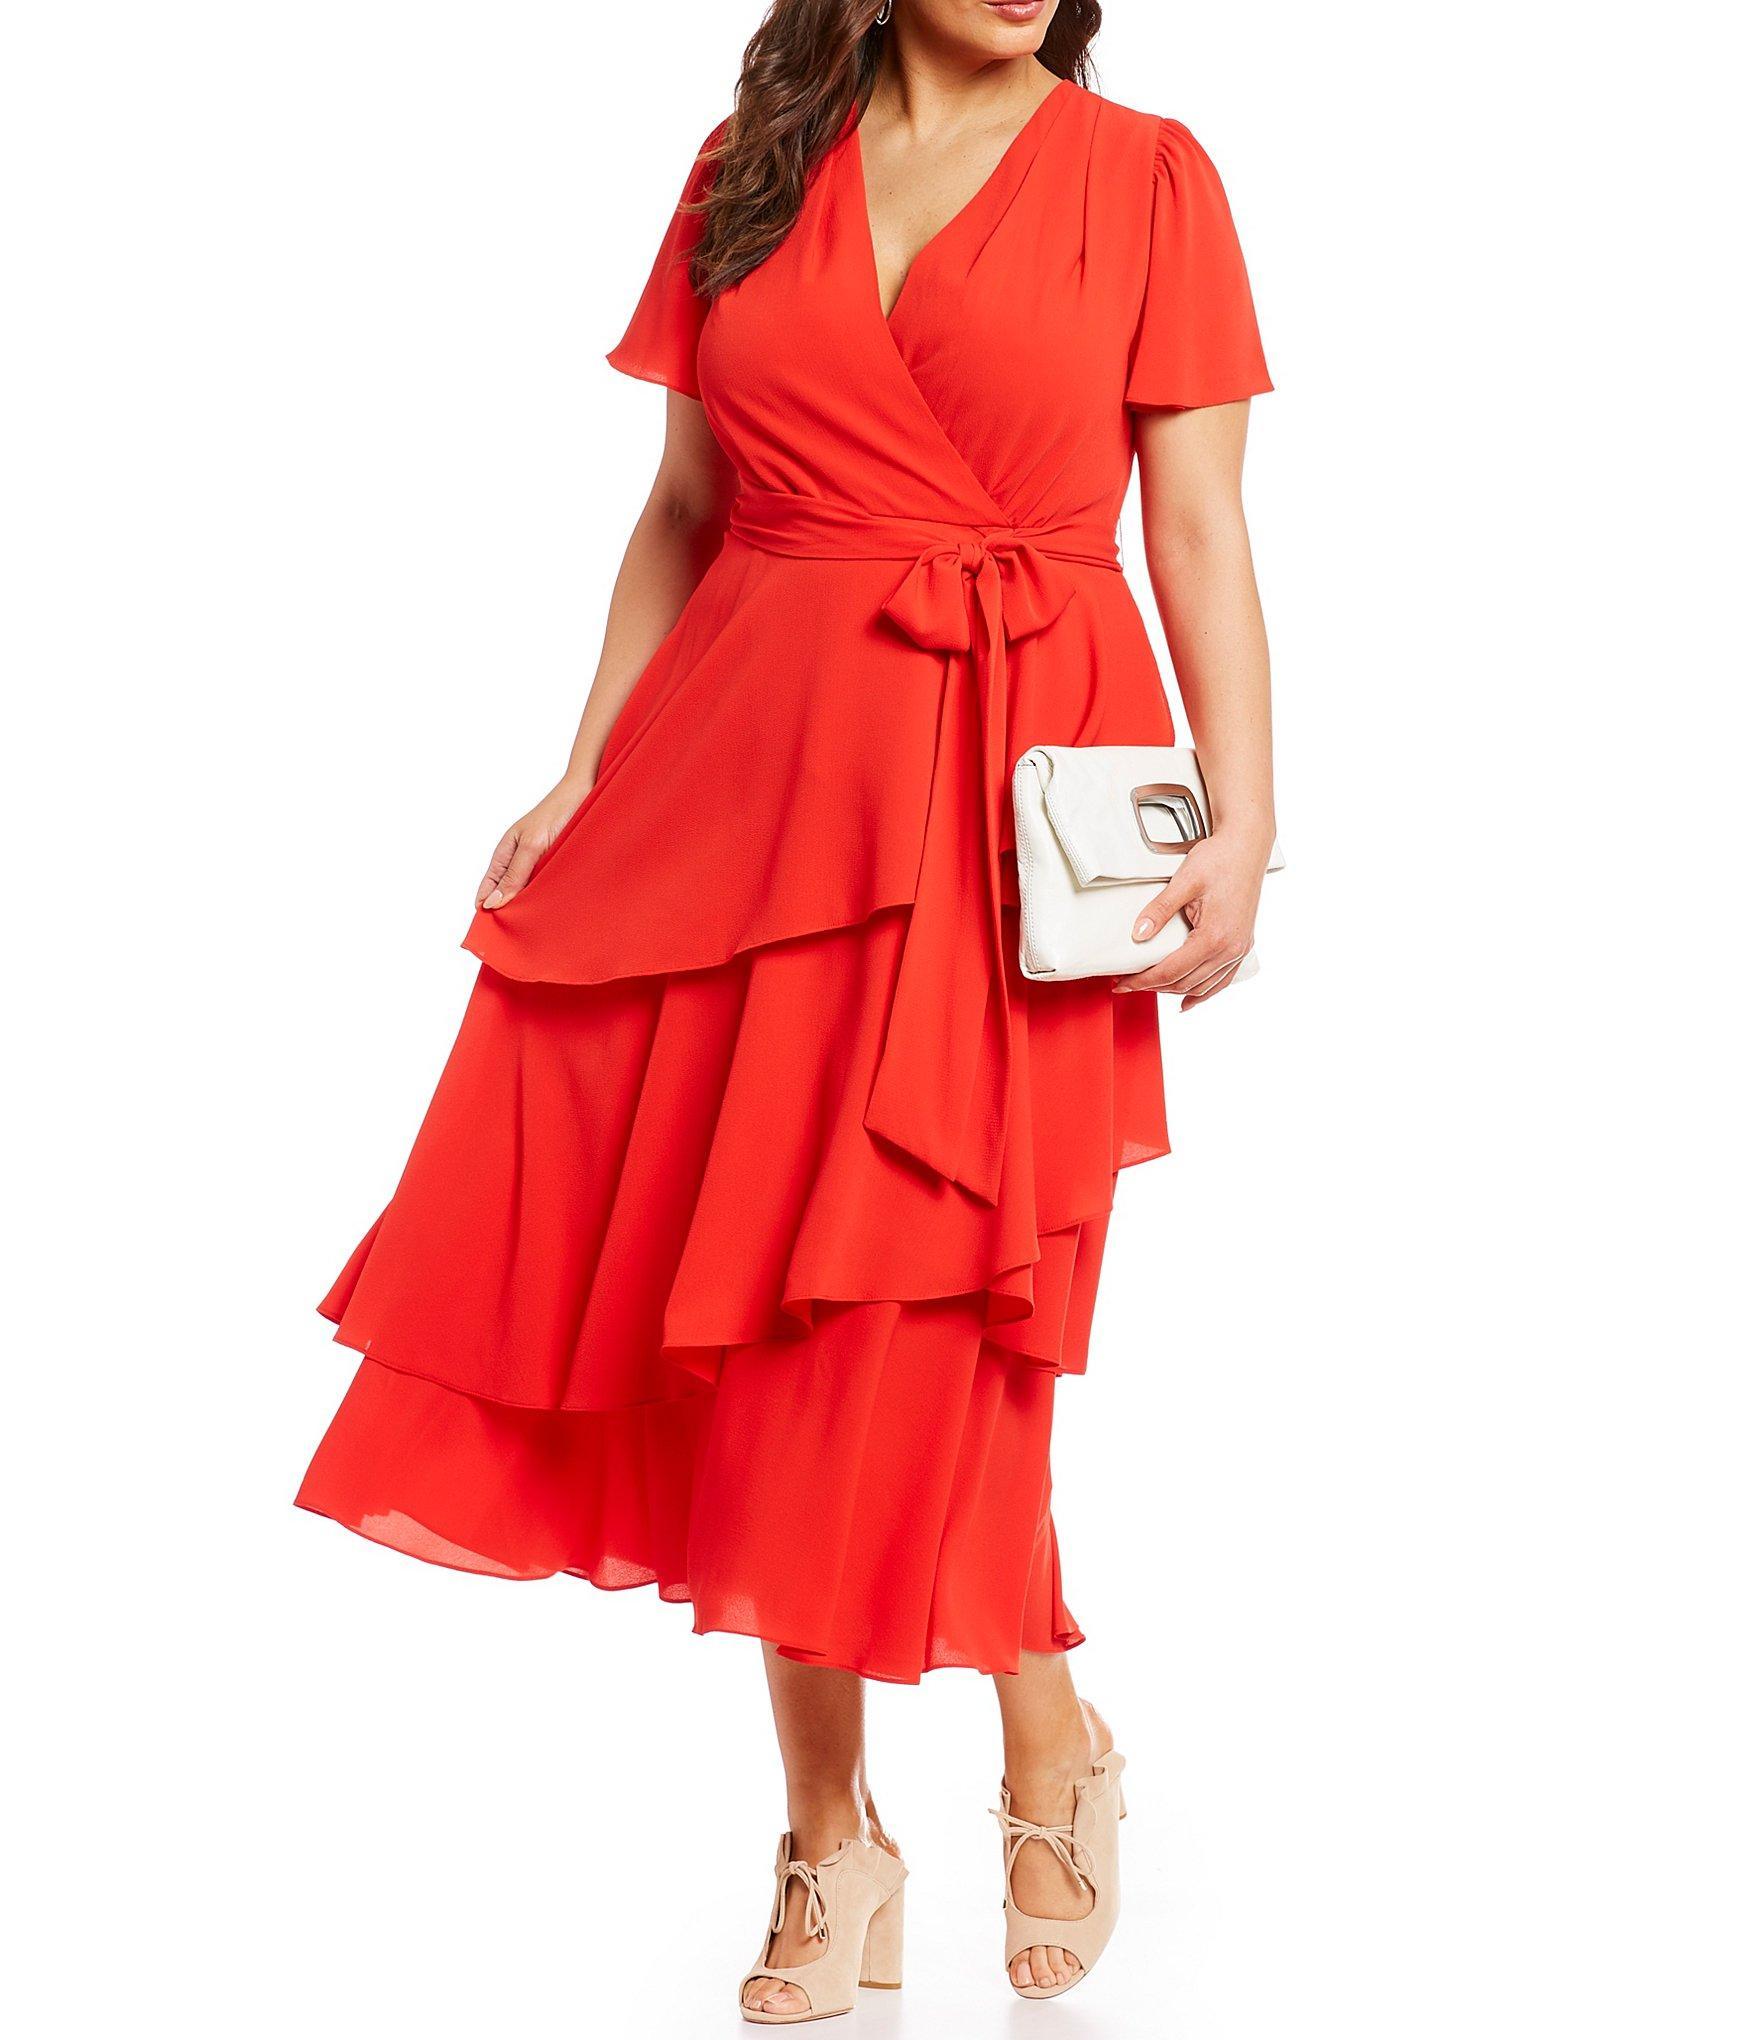 ce9f1c96aab6 Tahari. Women's Plus Size Short Sleeve V-neck Tie Waist Tiered Crepe Midi  Dress